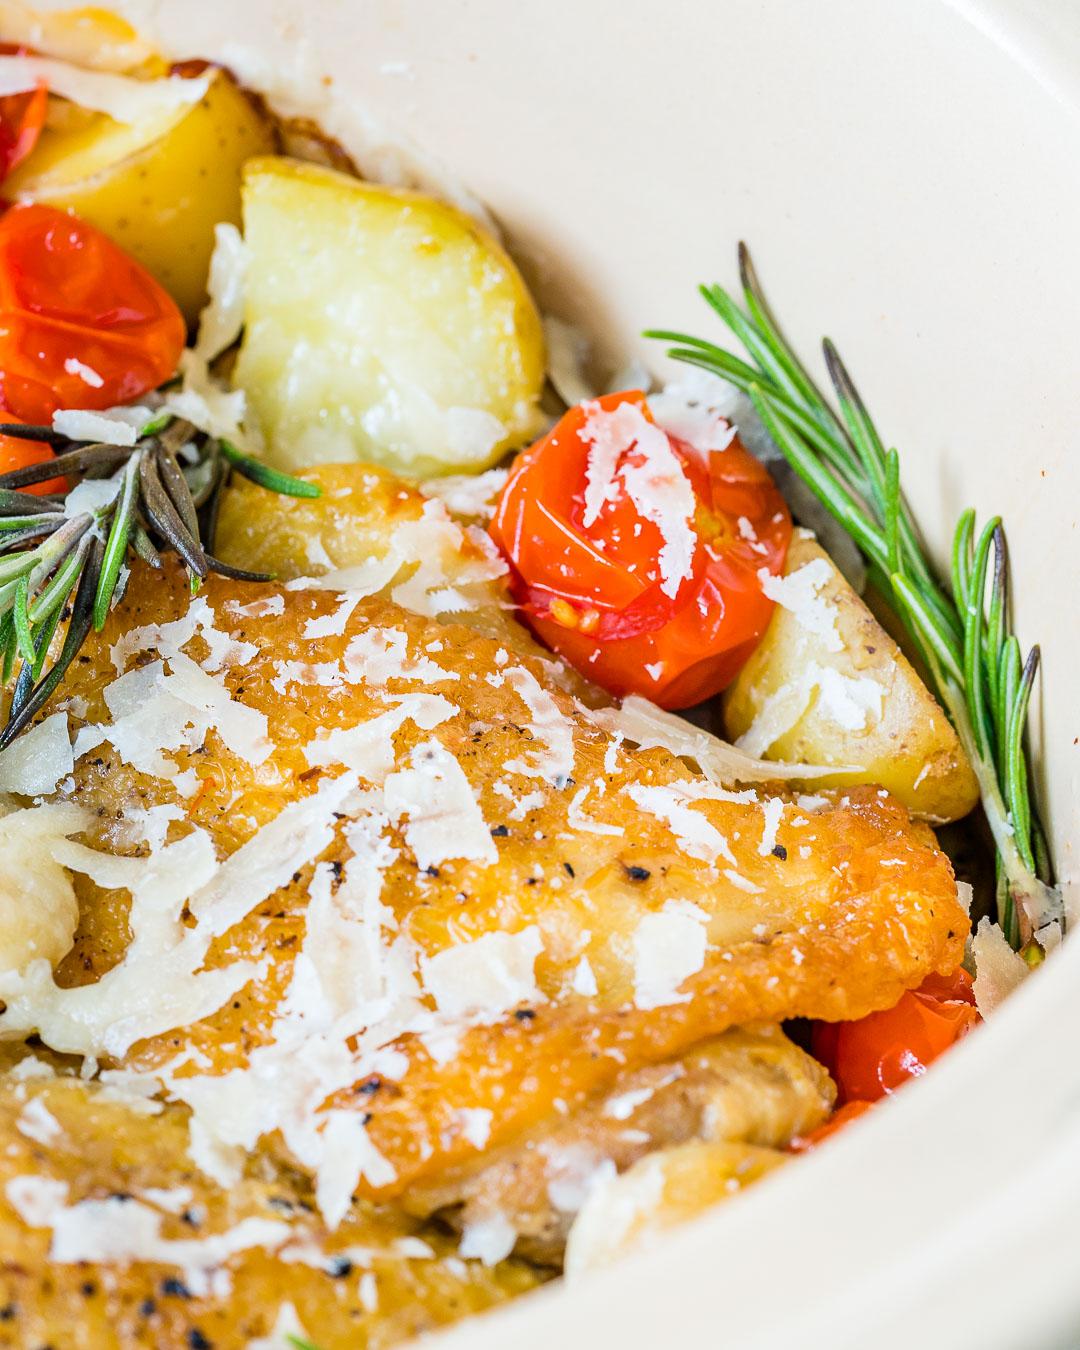 Slow cooker garlic rosemary chicken Clean Food Idea